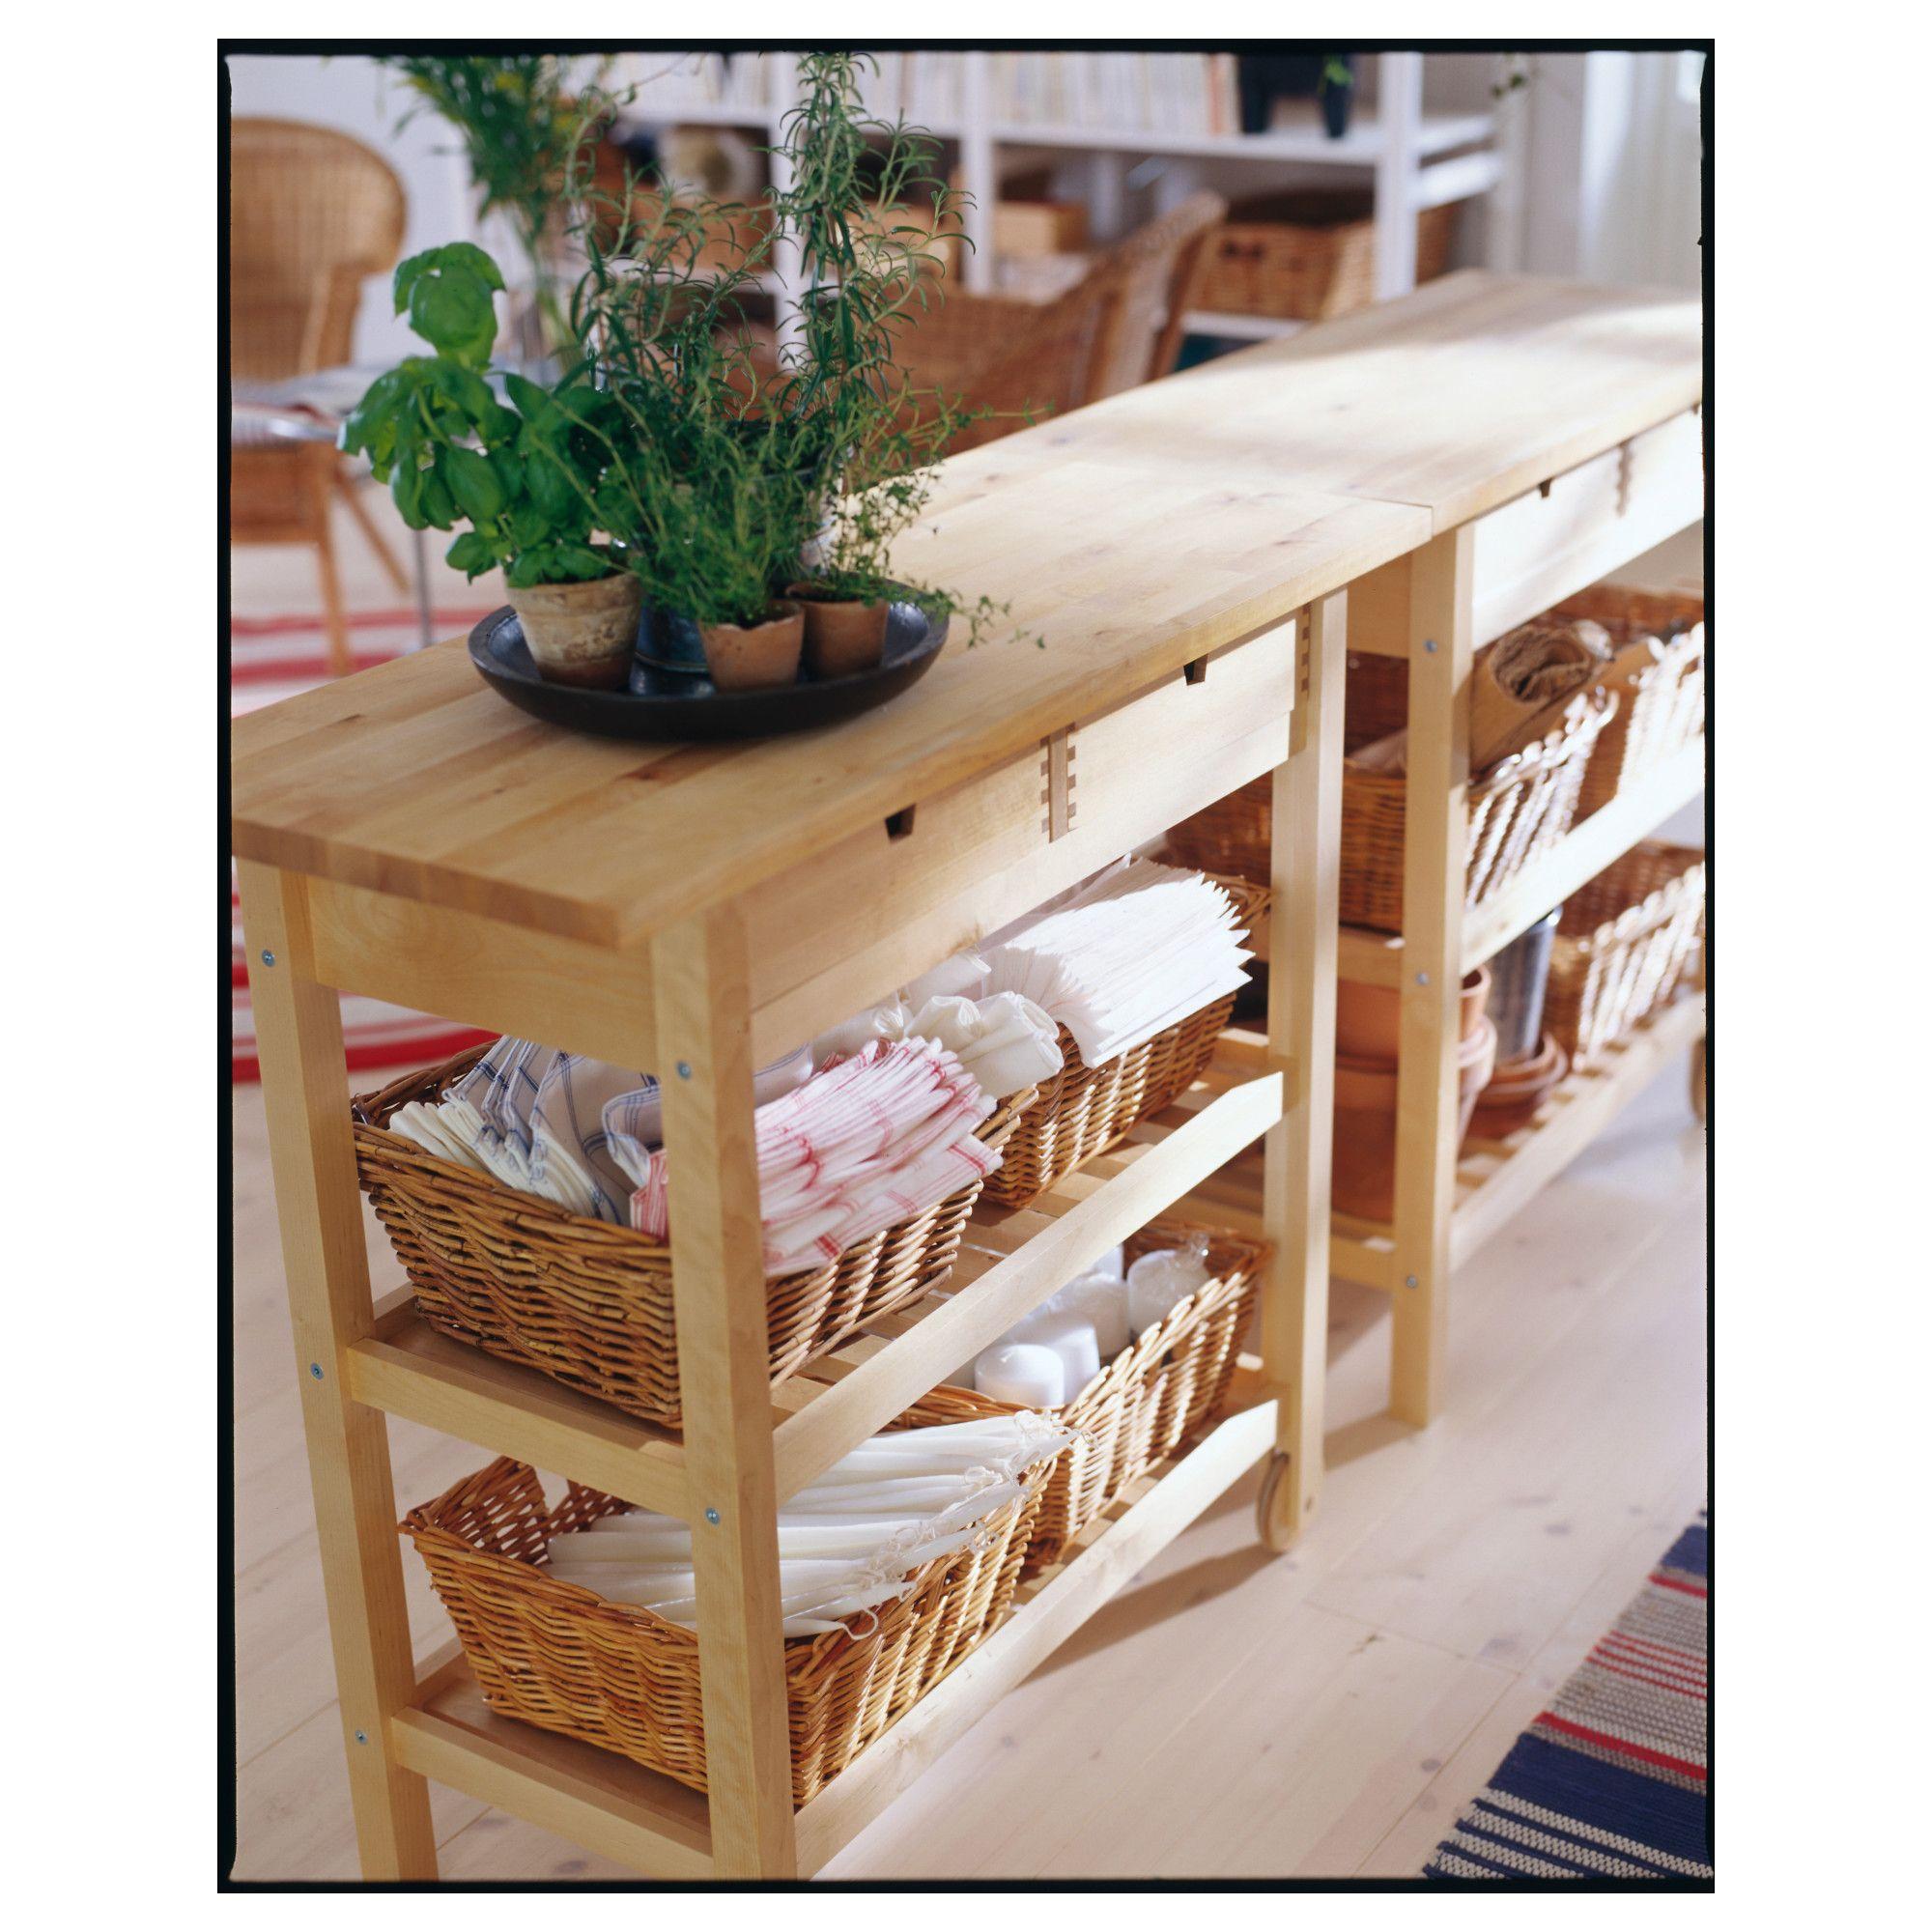 a09293b3bf03ba083b08437633bf0b38 Meilleur De De Ikea Table Jardin Conception